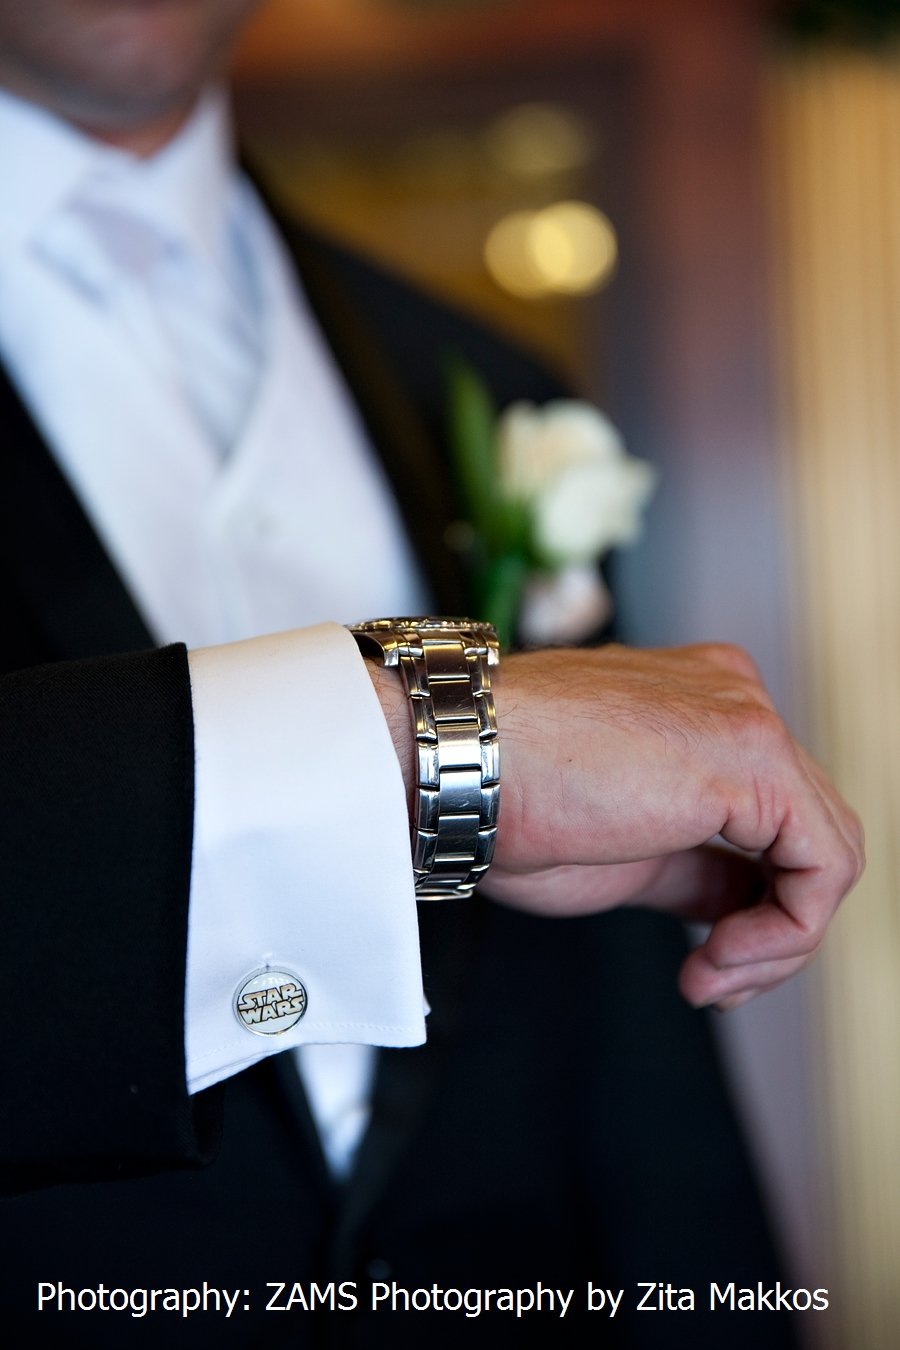 7_deadly_sins_greed_cuff_links_men_wedding_groomsmen_cufflinks_2.jpg